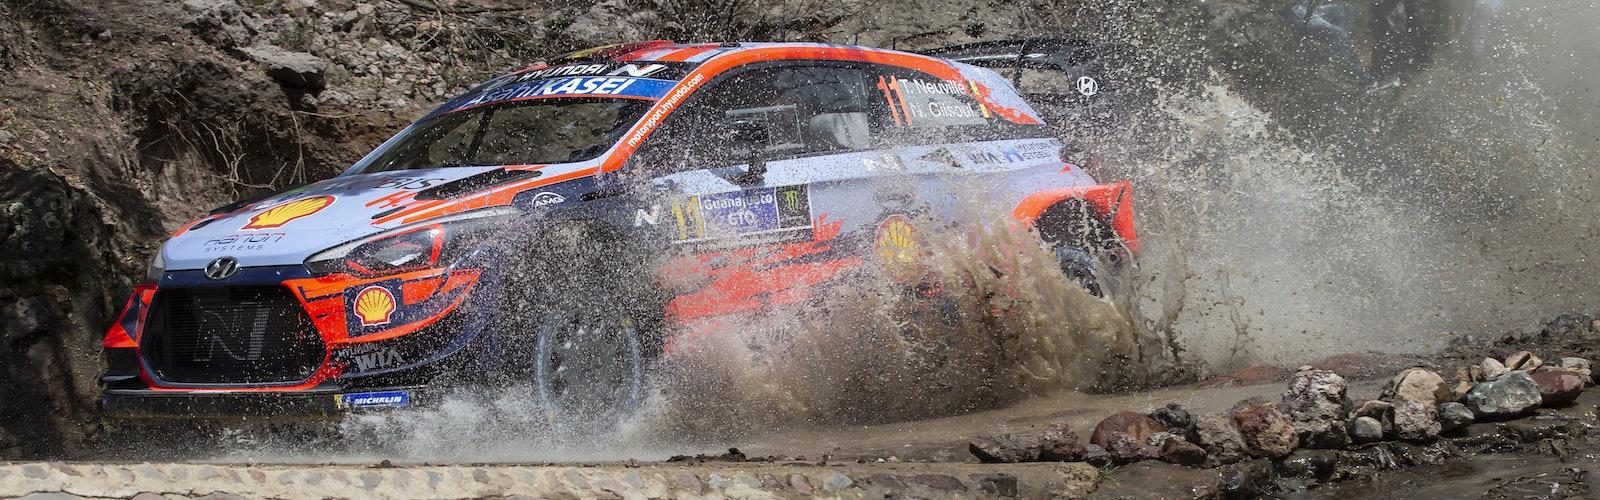 Neuville Hyundai Mexico WRC